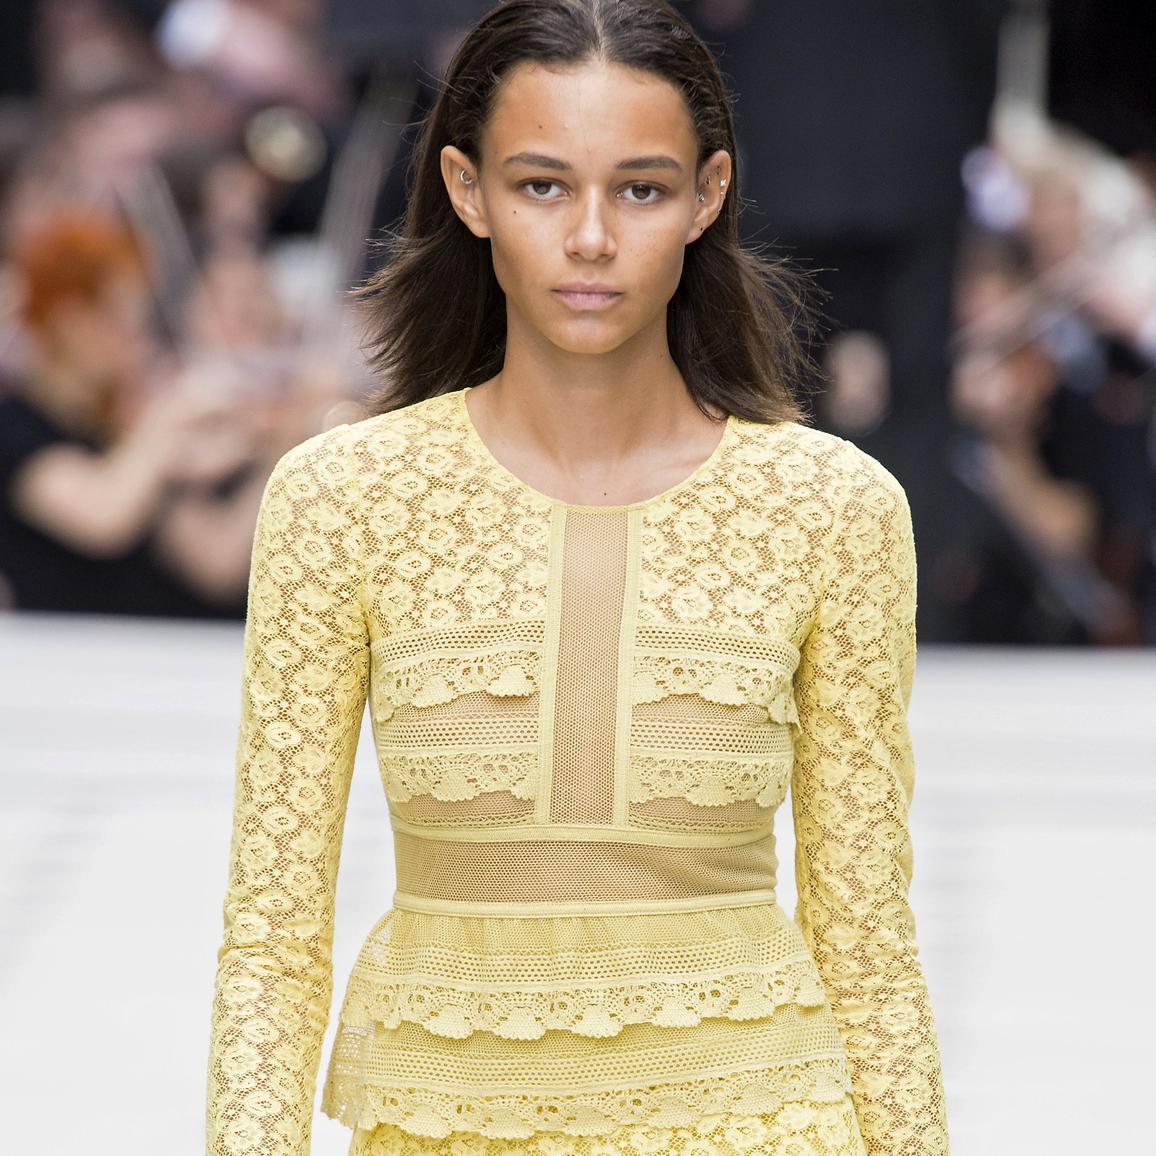 Burberry tente une approche inédite de la Fashion Week